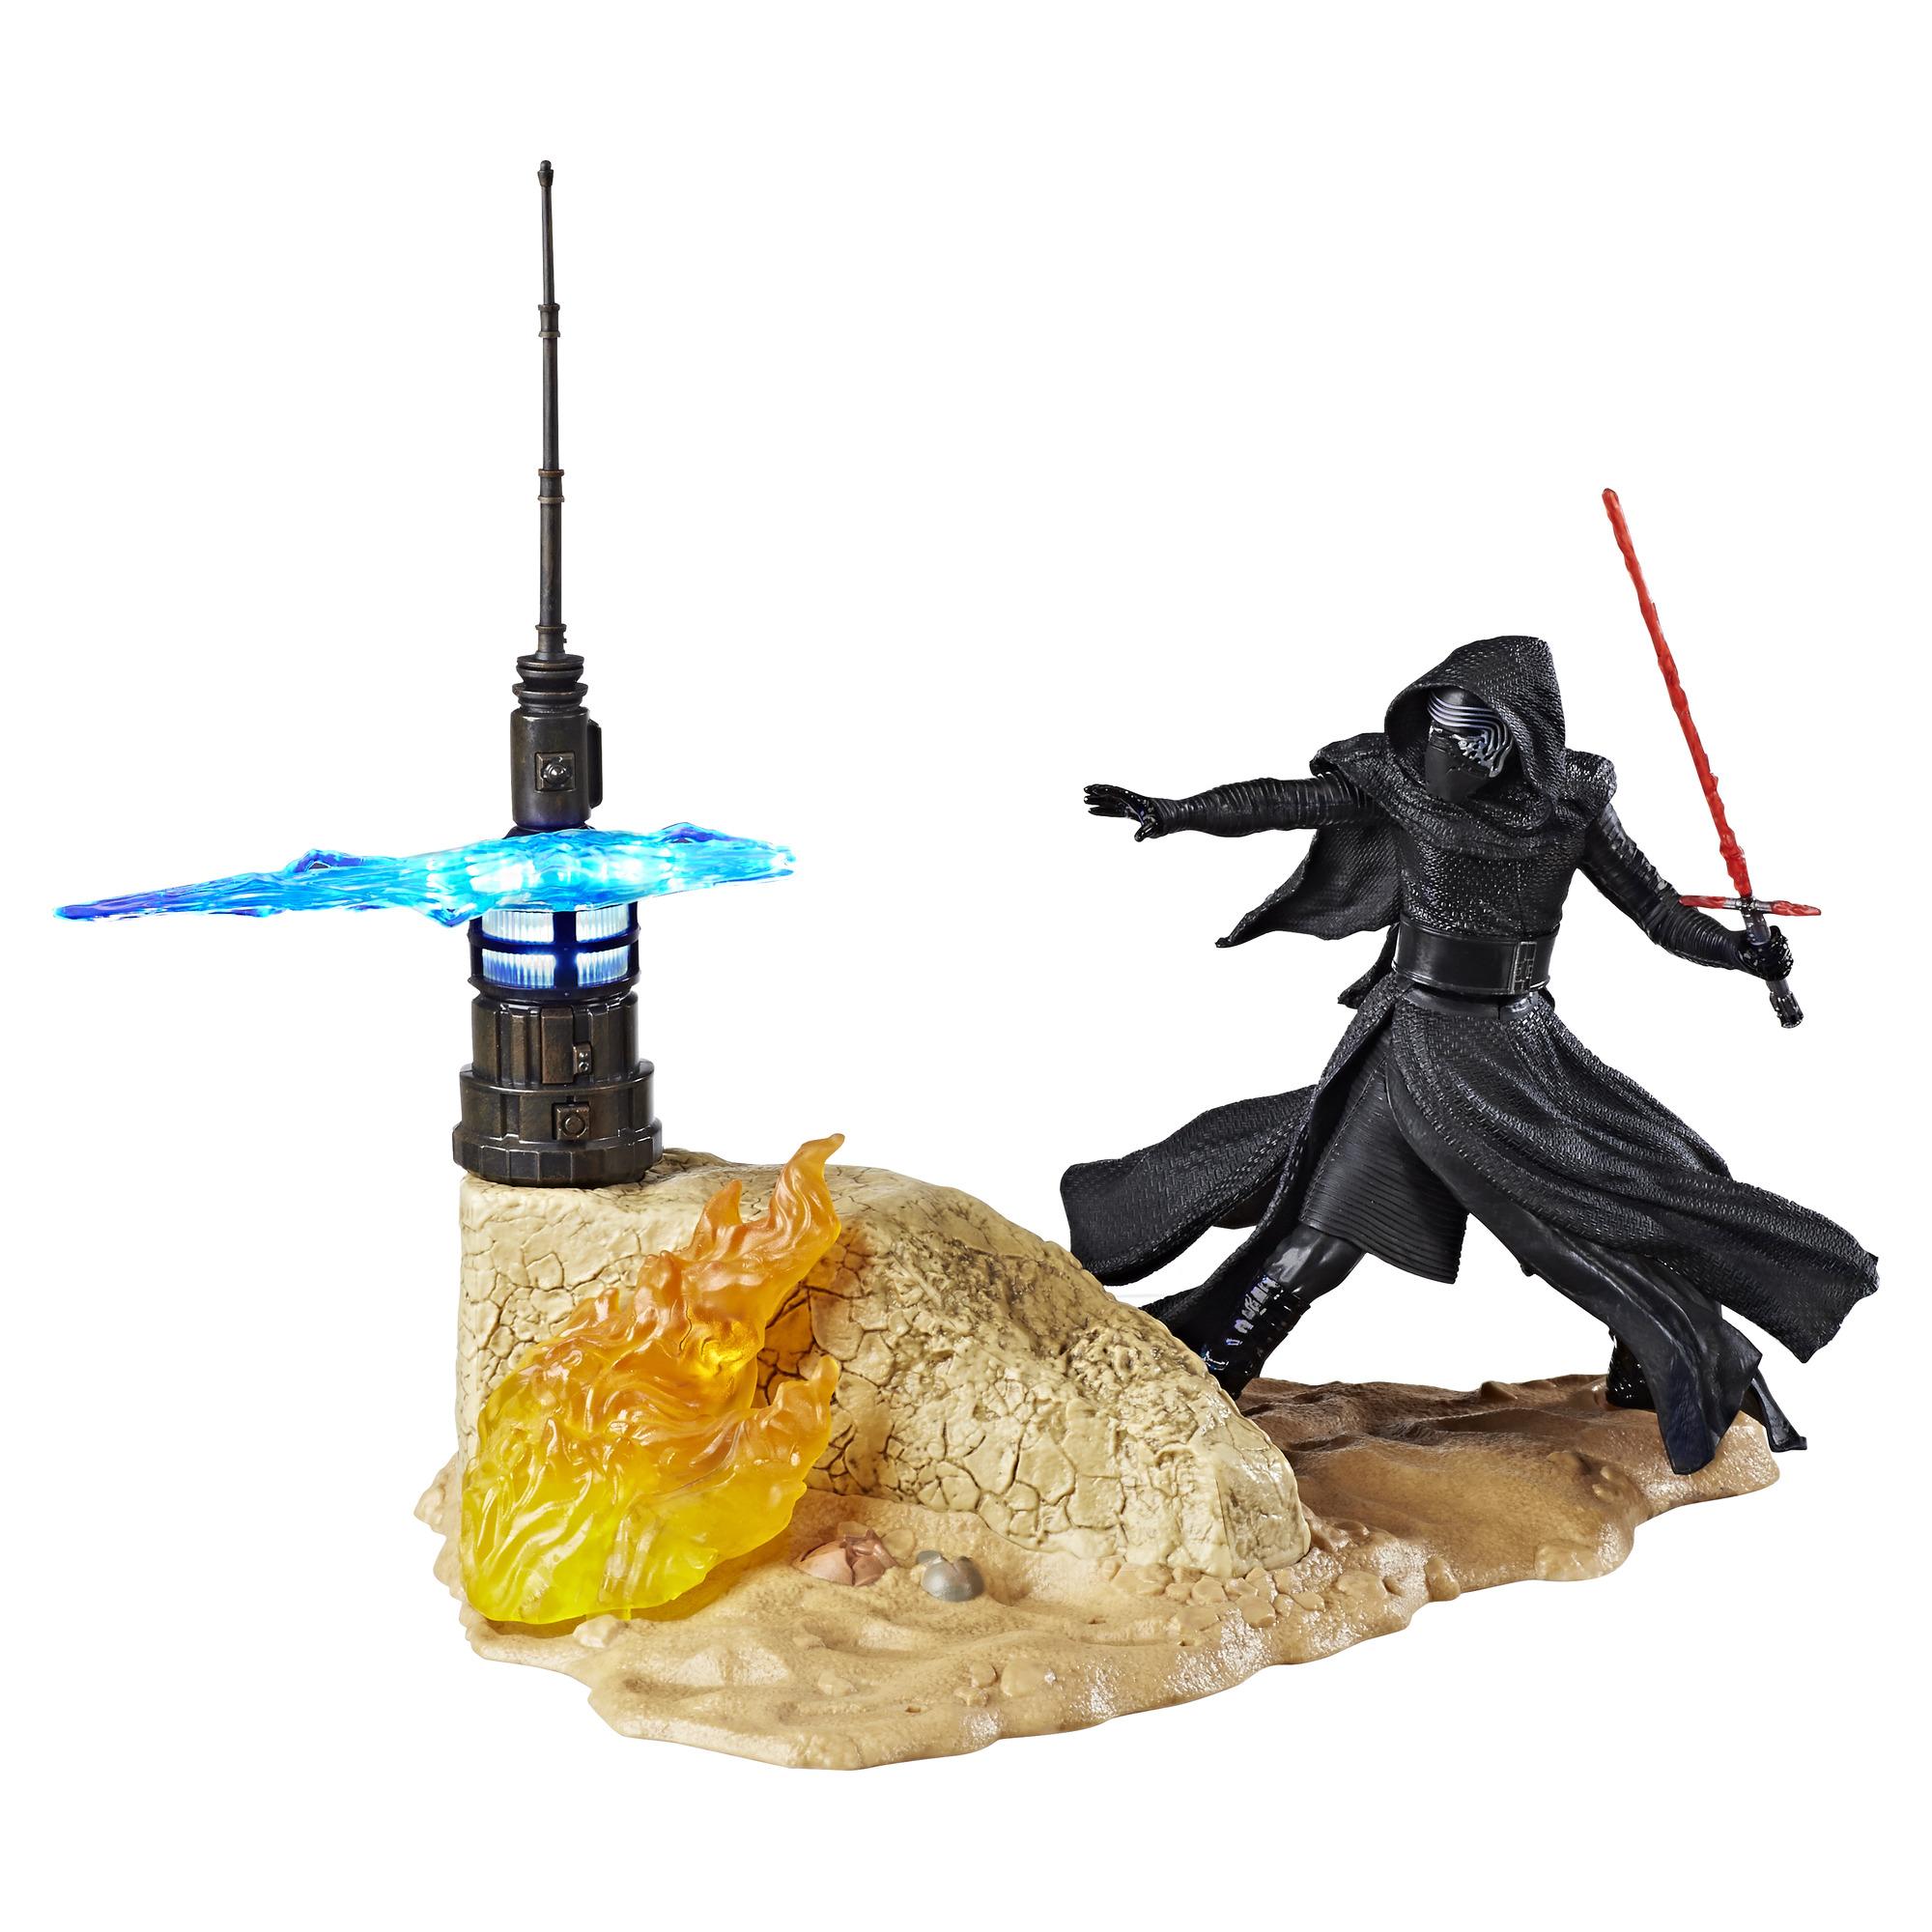 Star Wars The Black Series Centerpiece Kylo Ren by Hasbro